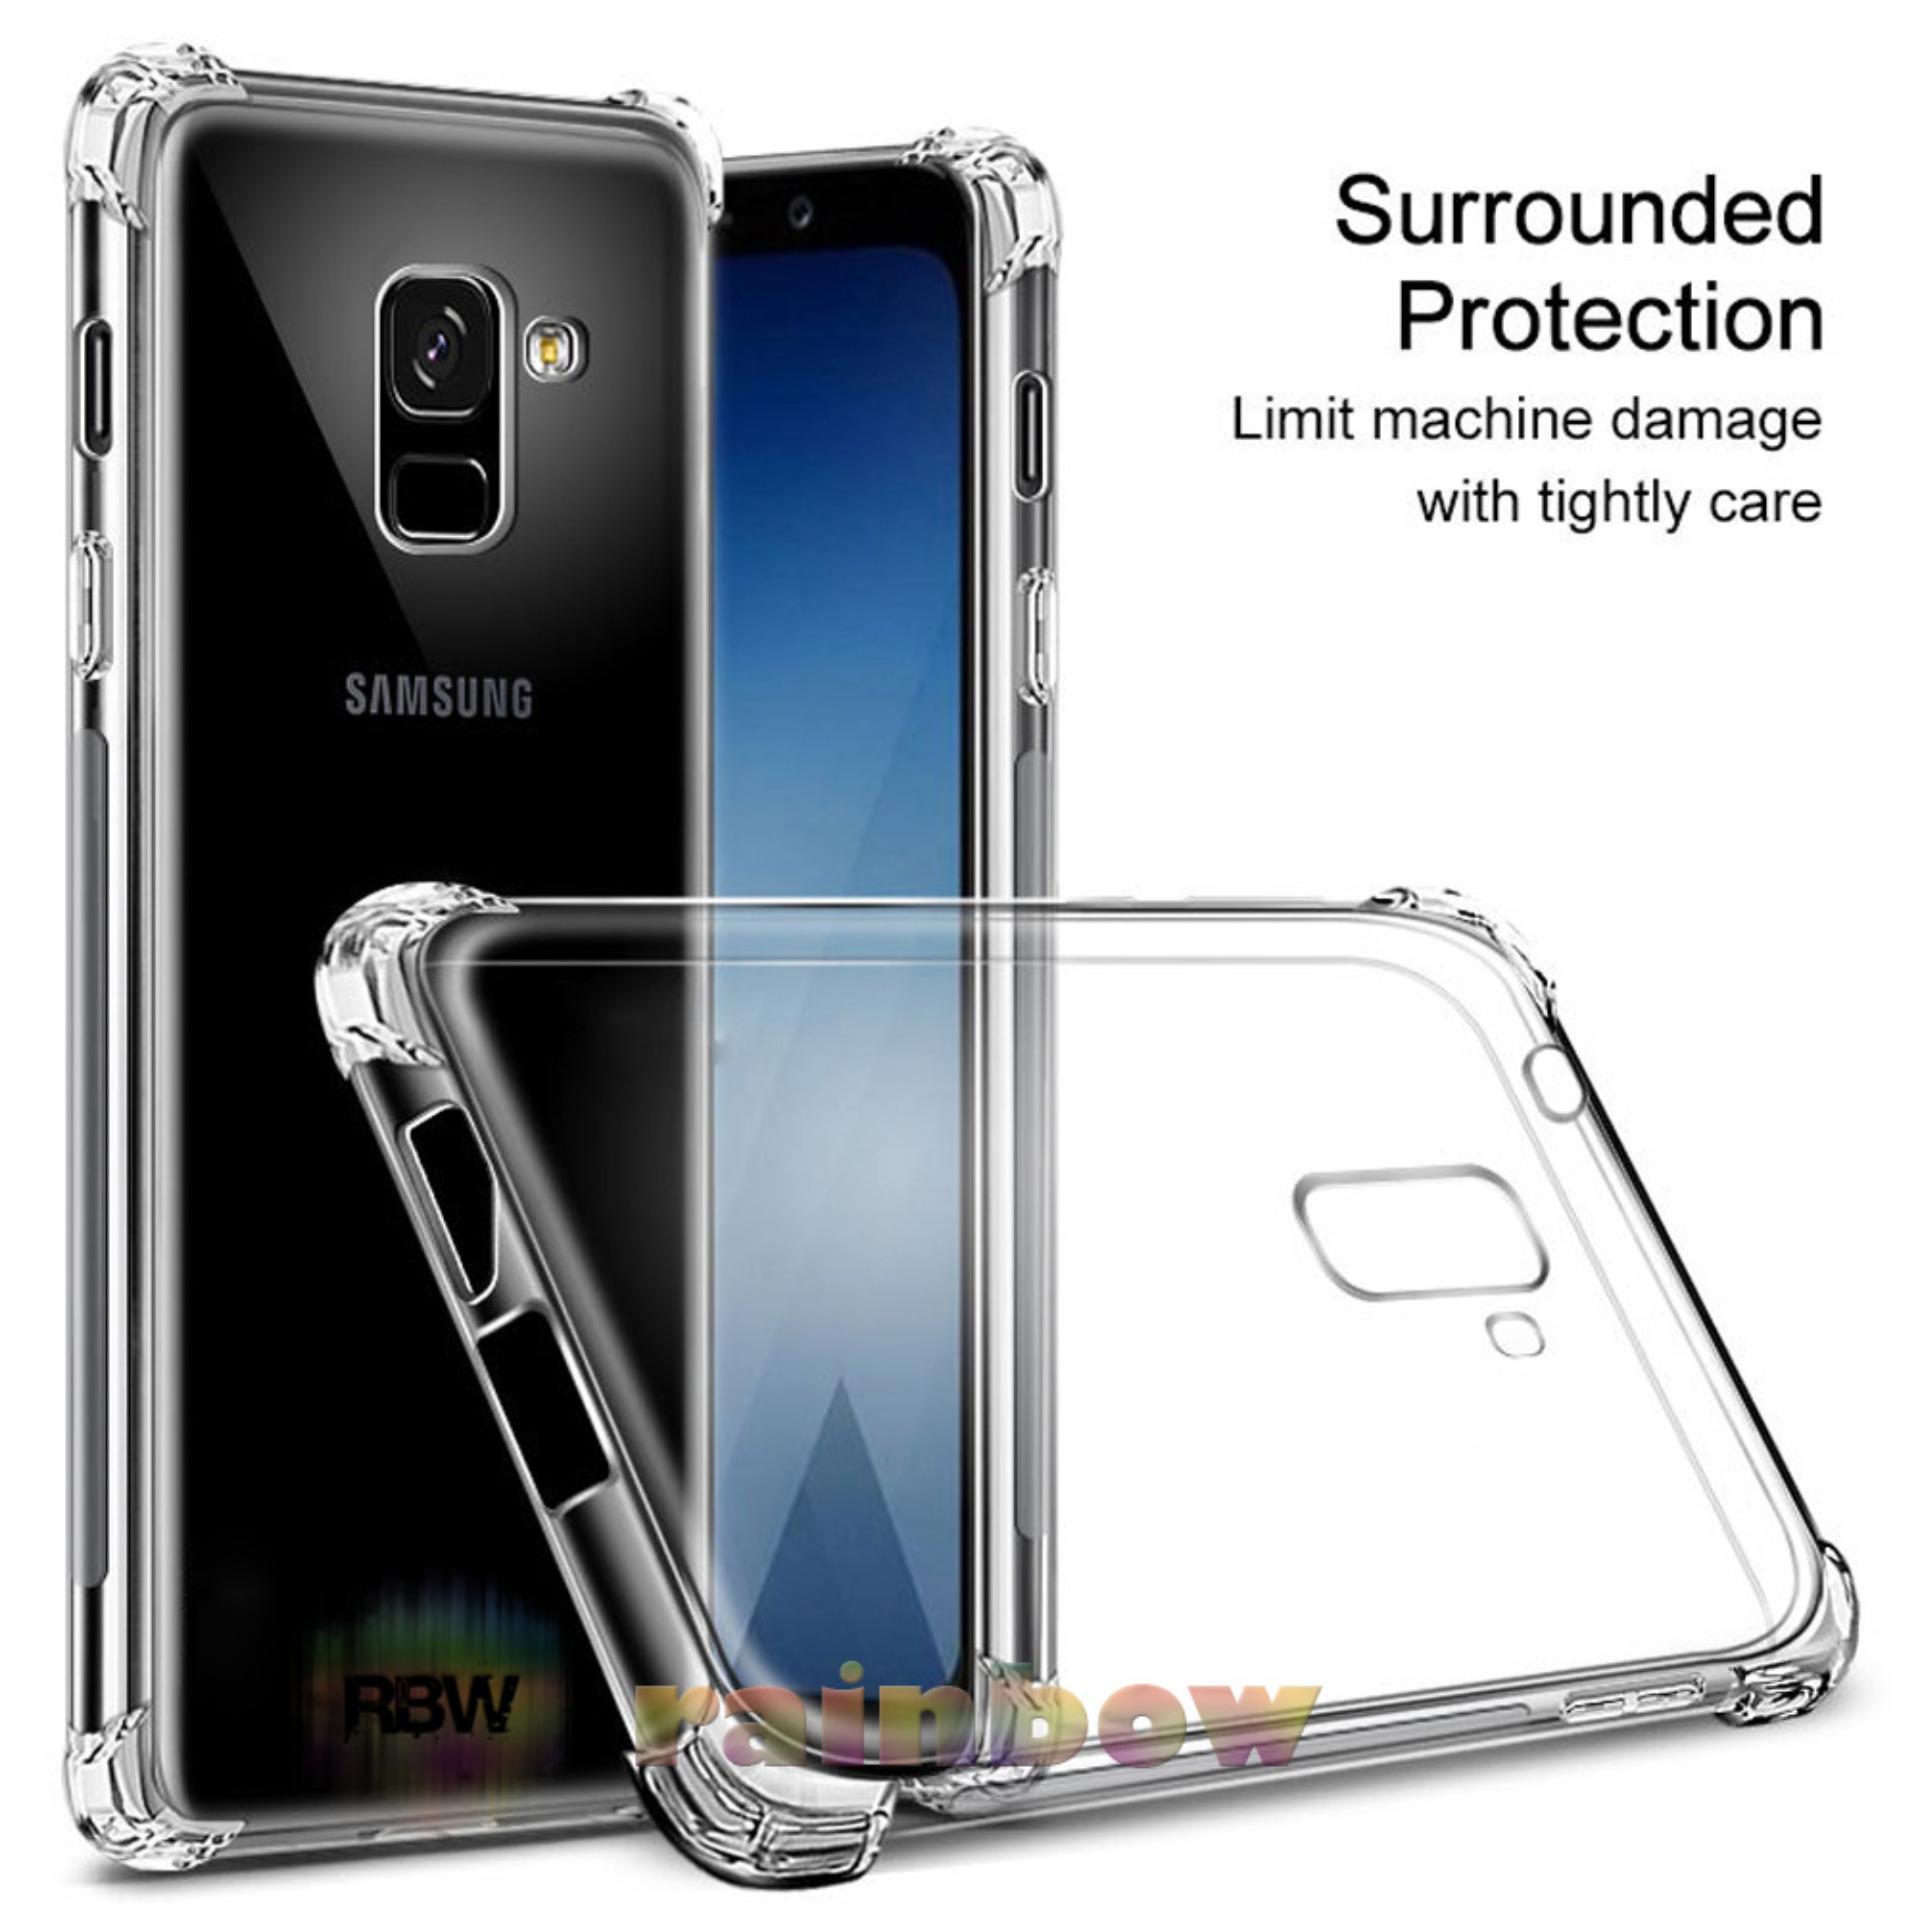 b595115ce8144e4a61fcaf51a7c5dd89 Daftar Harga Daftar Harga Dan Spesifikasi Hp Samsung Update Terbaru Februari 2019